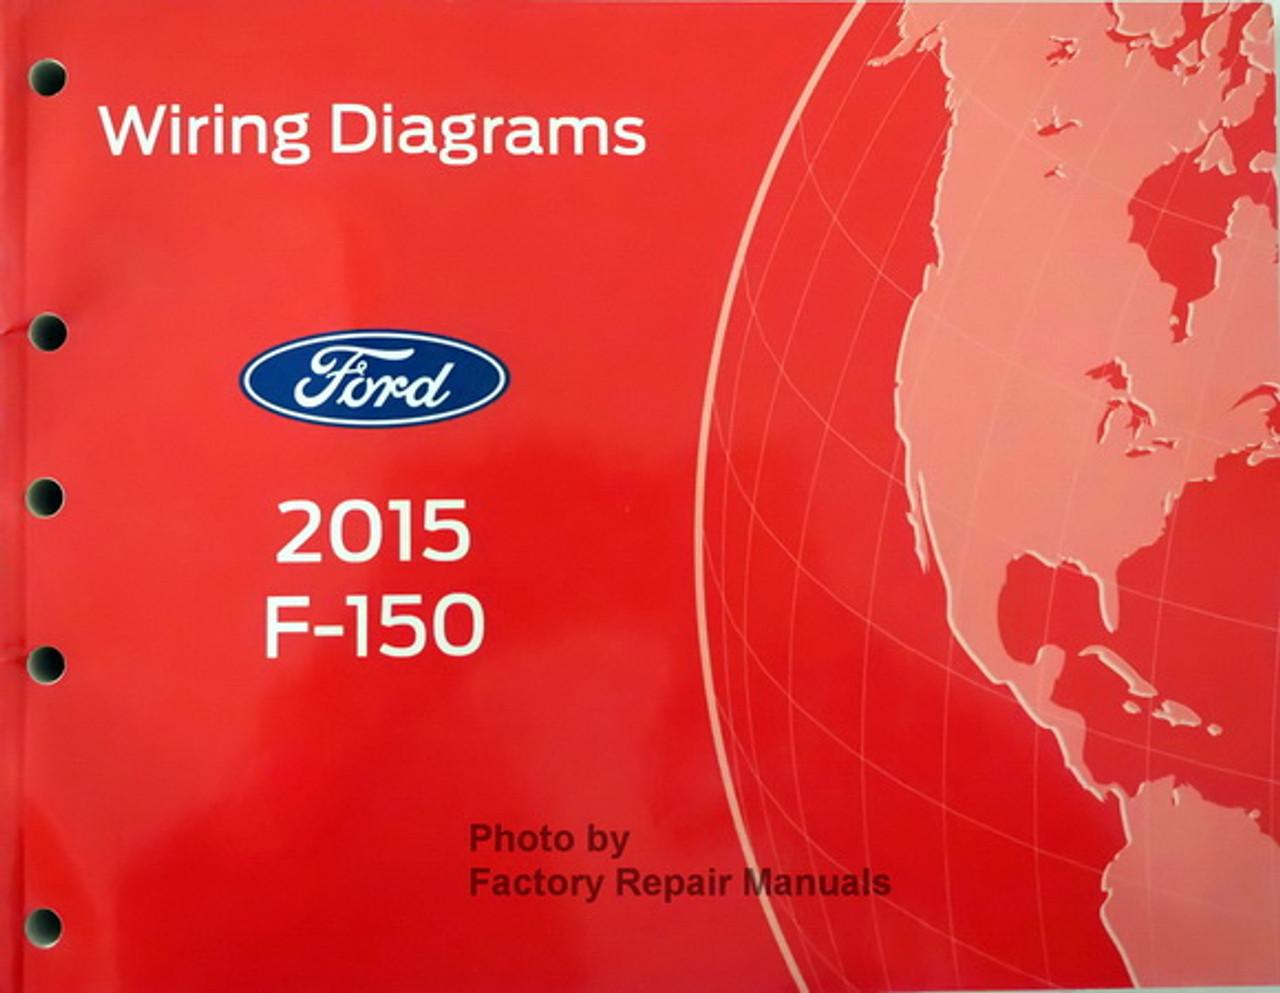 2015 Ford F150 Factory Wiring Diagrams Original Manual - Factory Repair  Manuals | Ford F750 Ac Wiring Diagram |  | Factory Repair Manuals